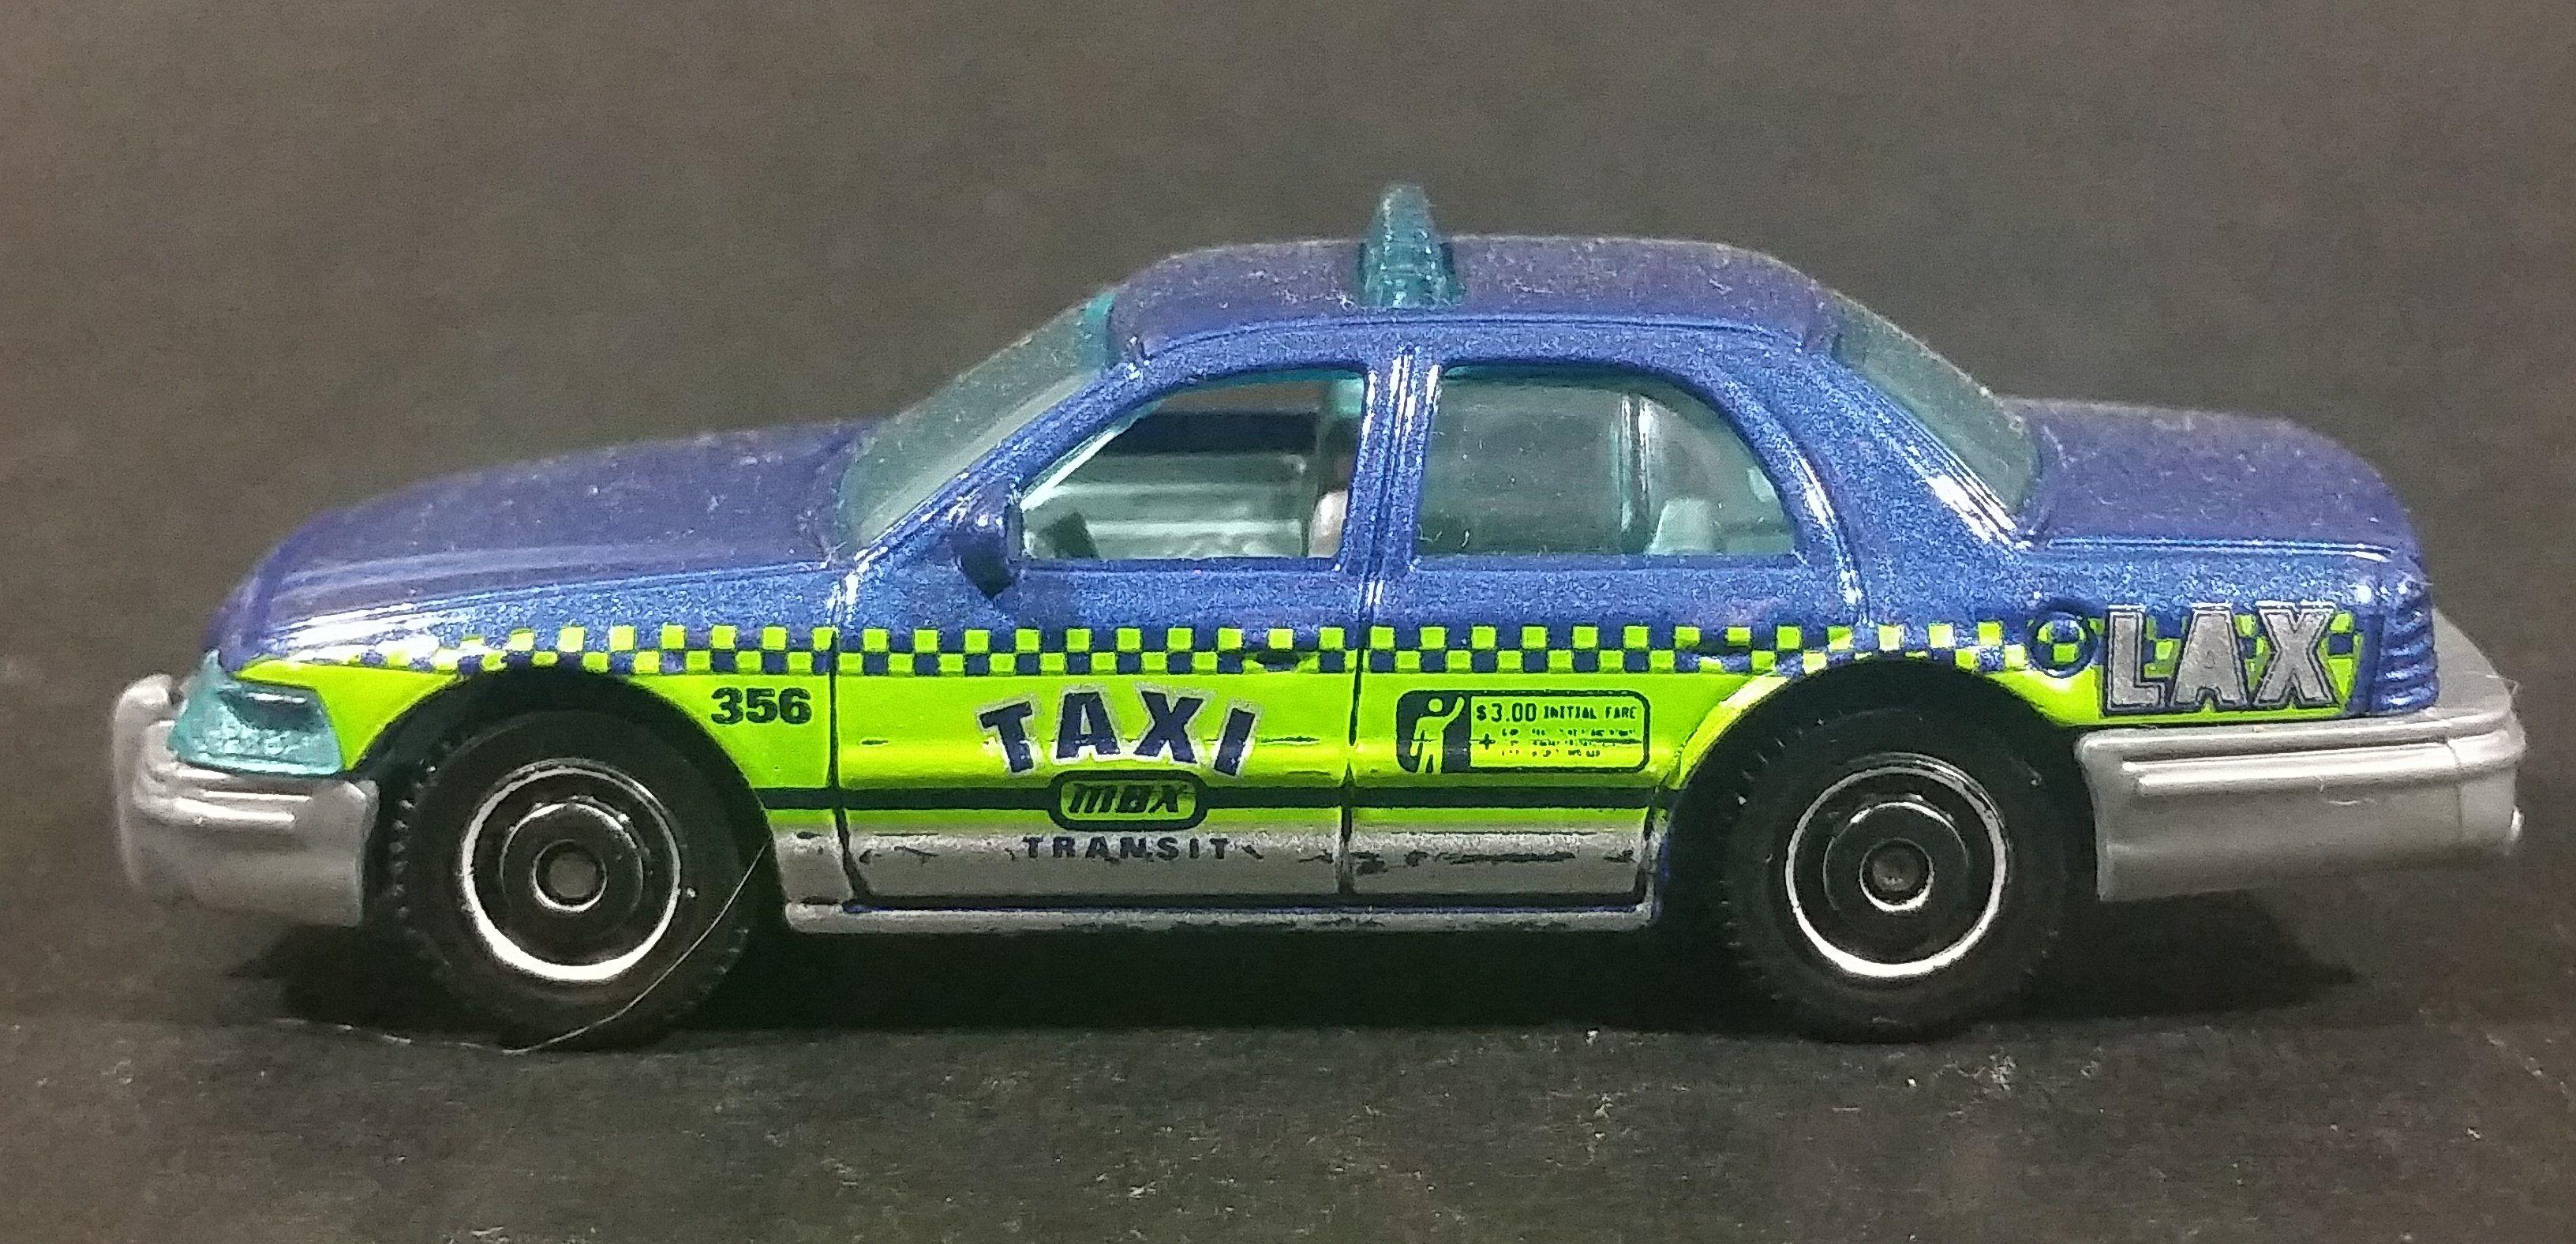 2016 Matchbox City 2006 Ford Crown Victoria LAX Taxi Blue Die Cast